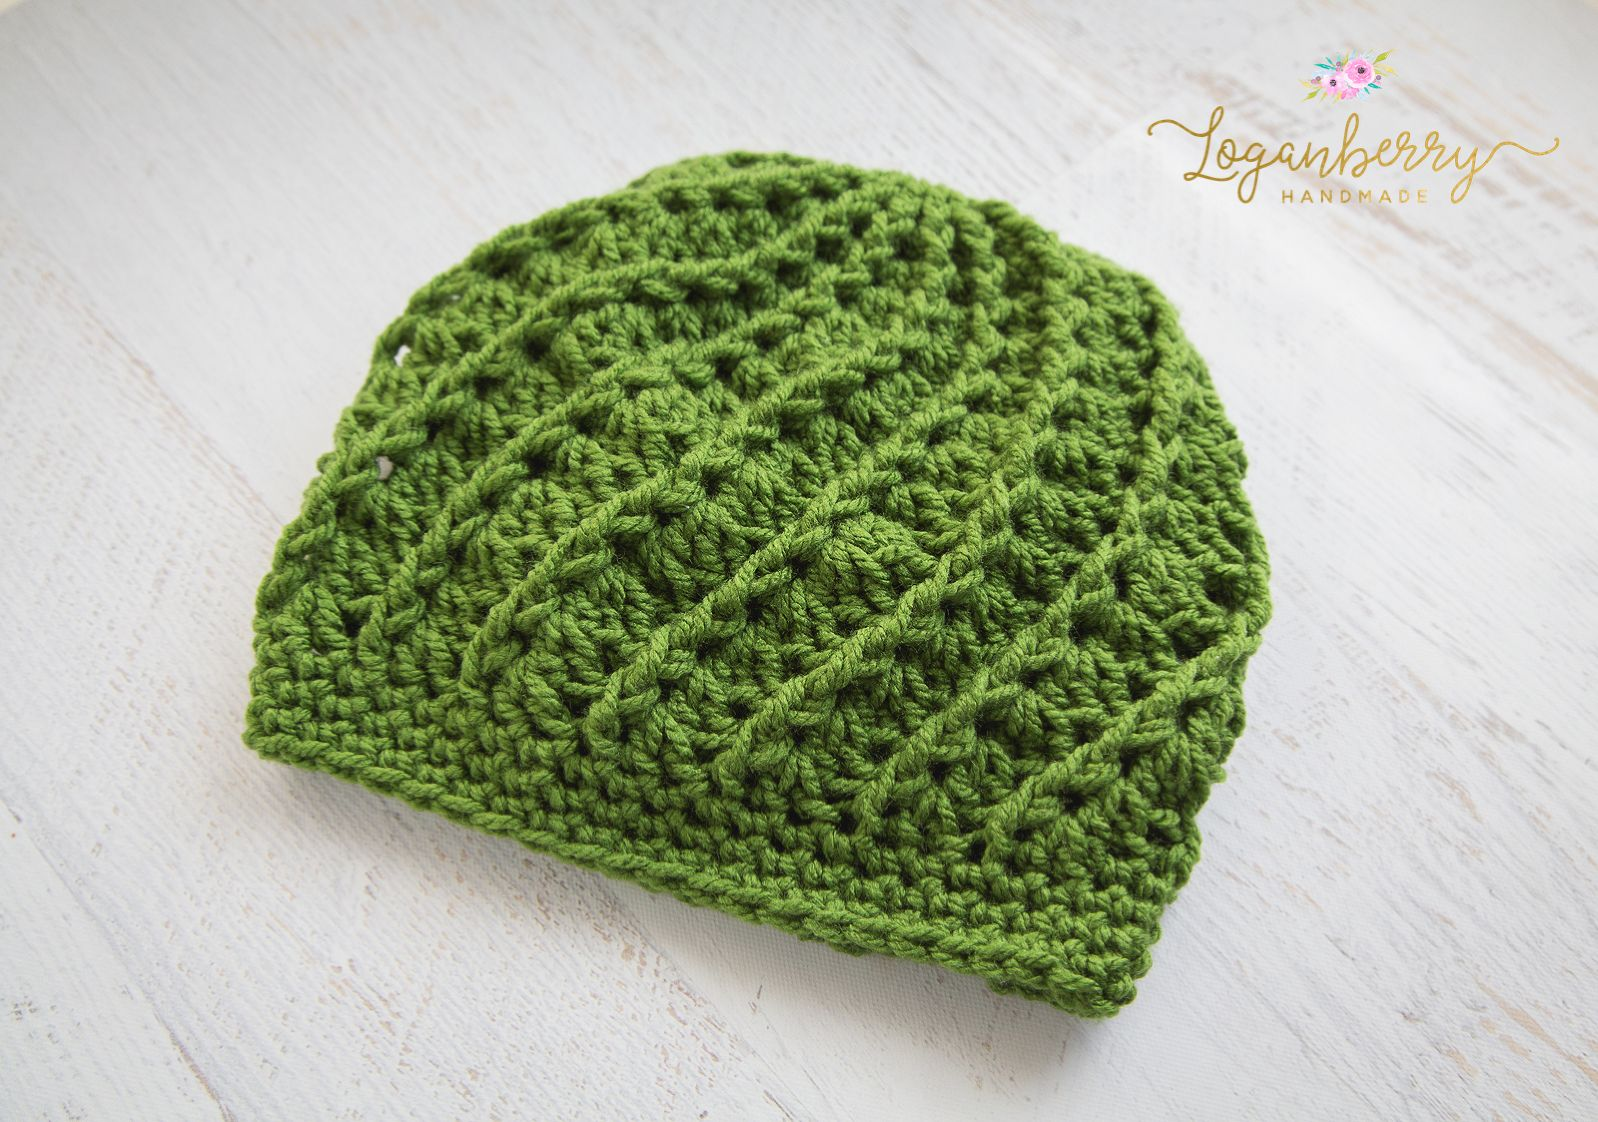 Free Crochet Pattern Spiral Crochet Beanie, Crochet Beanie Tutorial ...